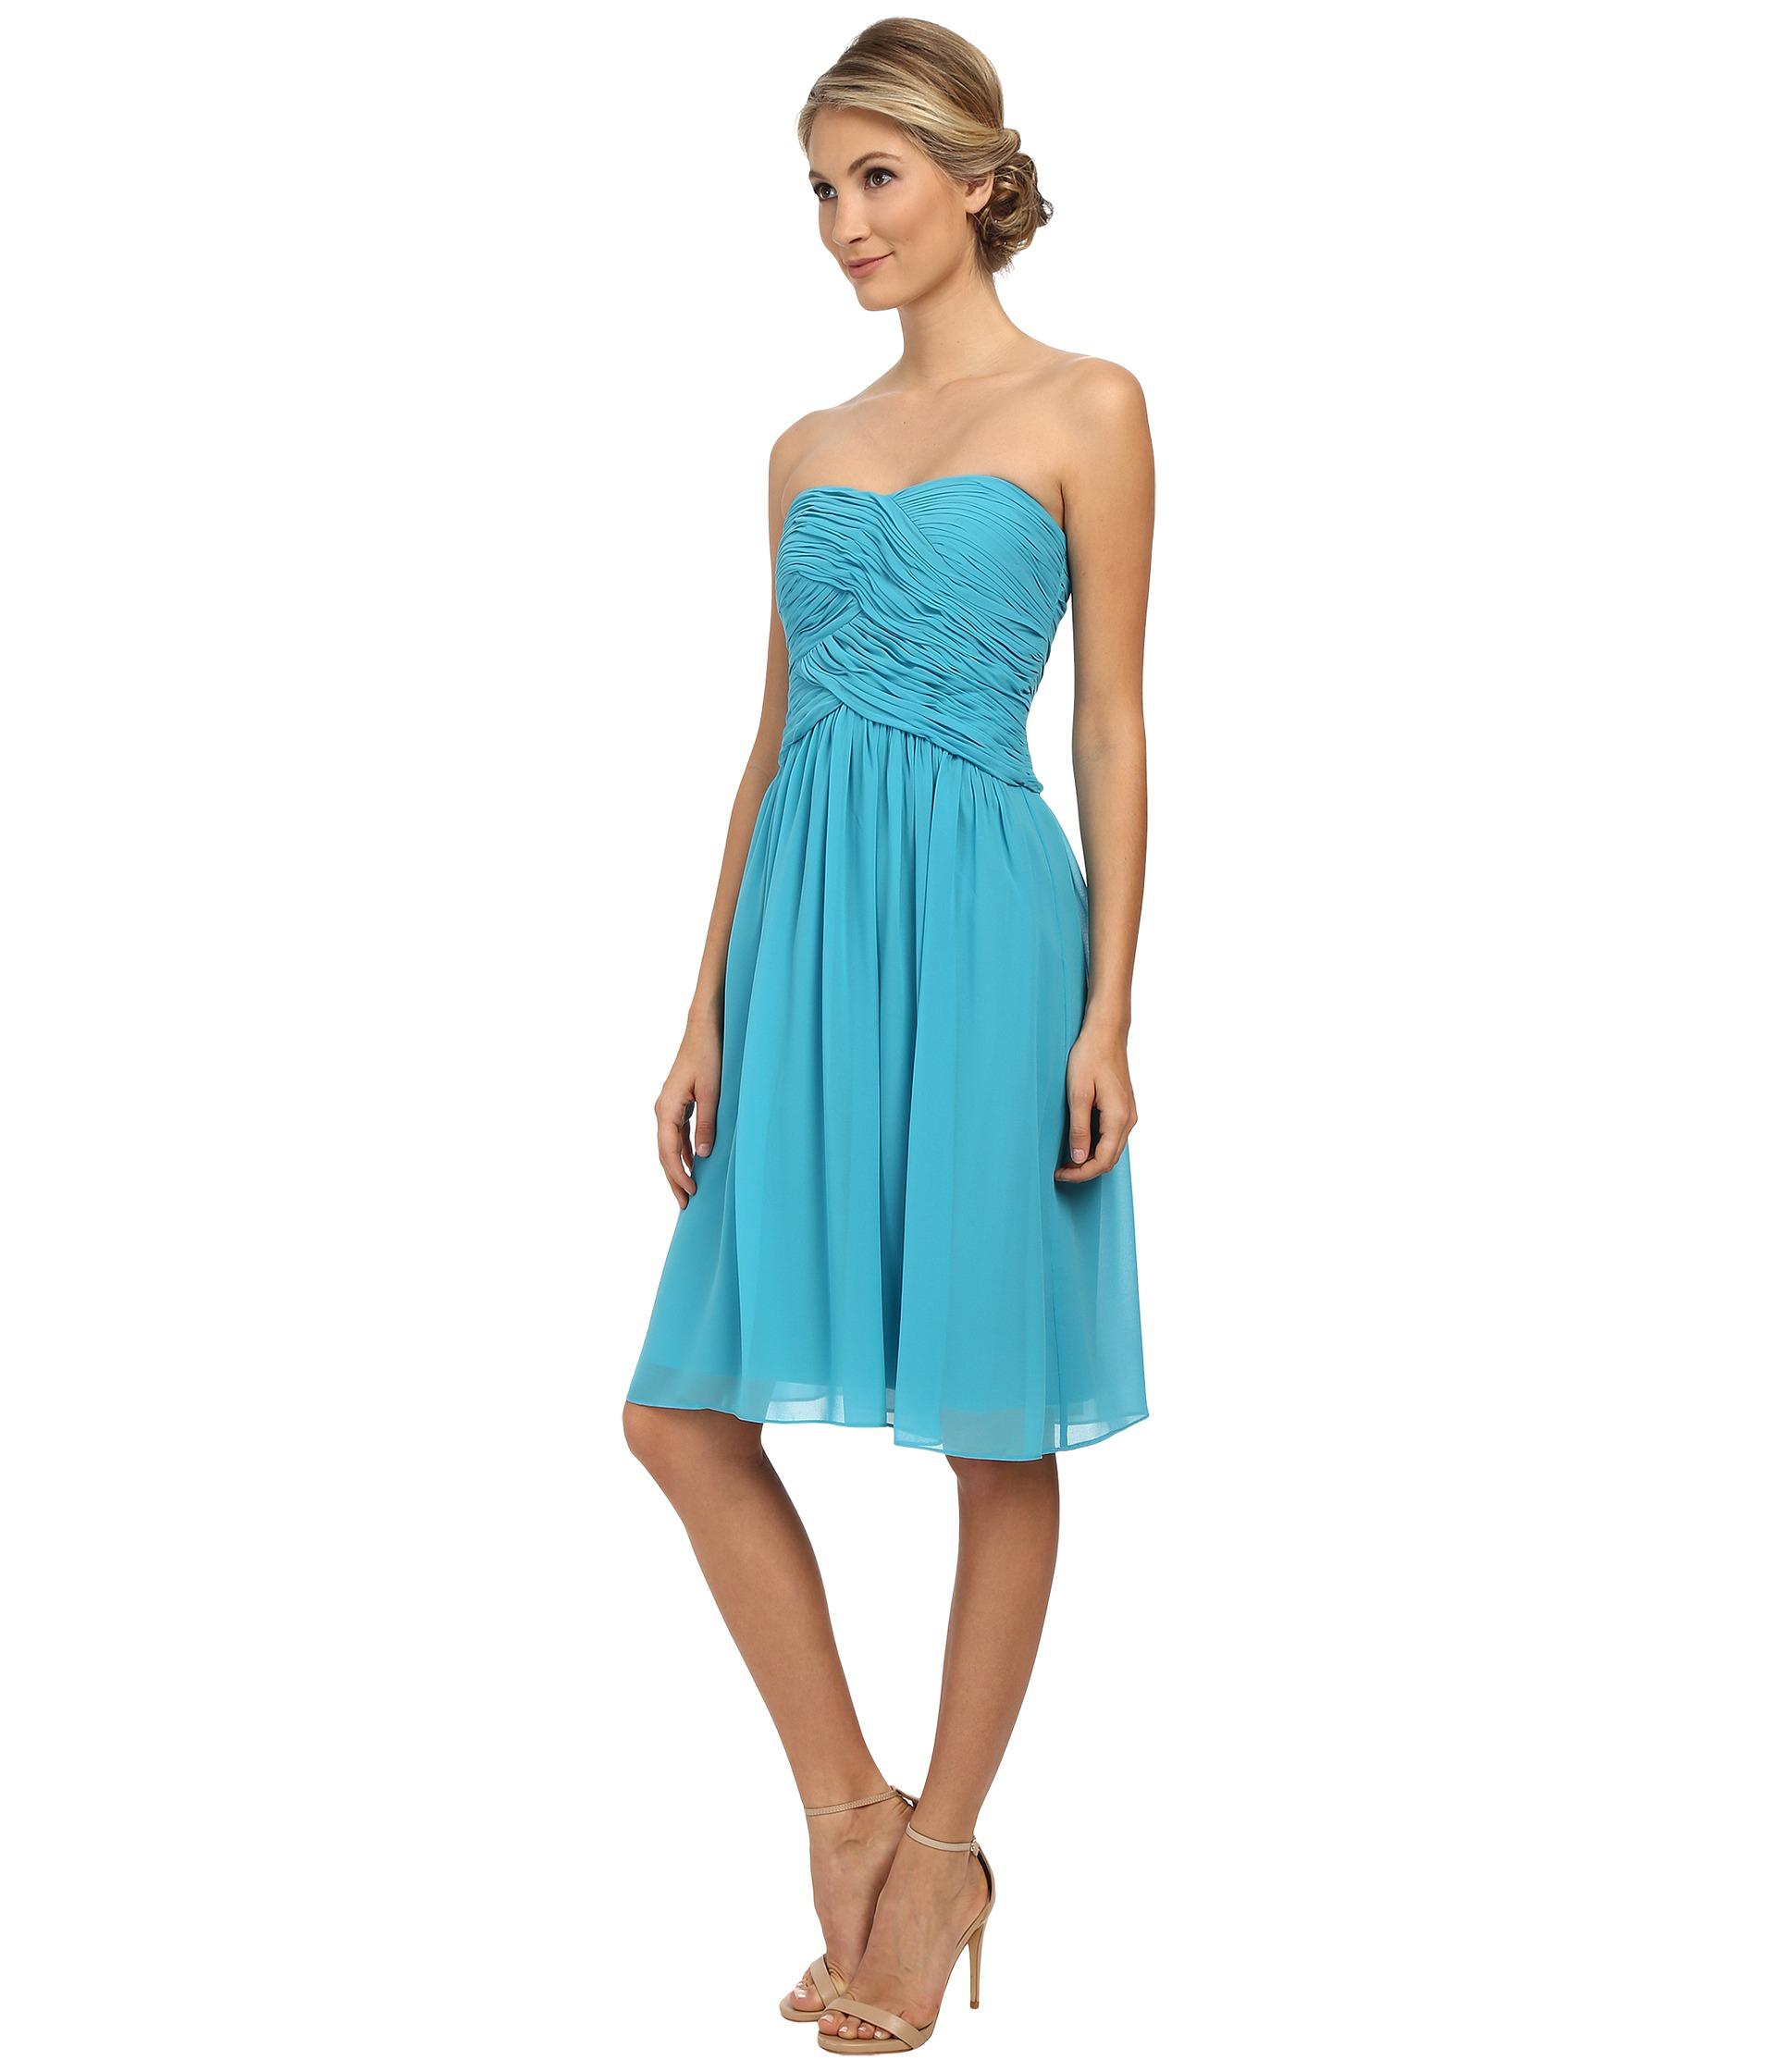 Strapless Short Chiffon Dress